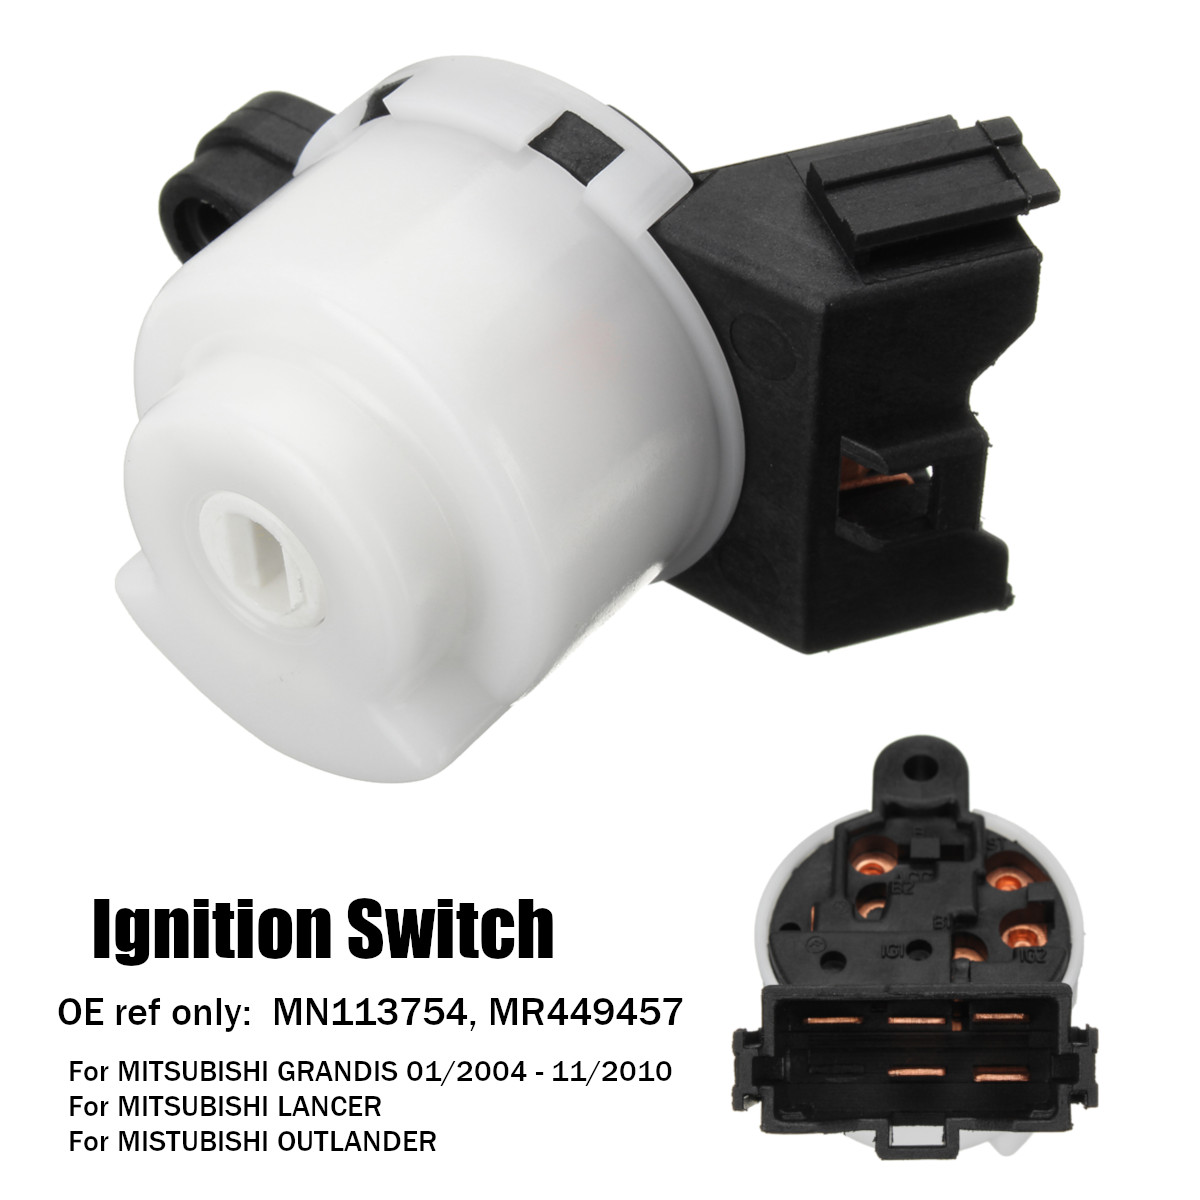 5 pins Ignition Starter Switch for MITSUBISHI GRANDIS LANCER OUTLANDER 2004 - 2010 MN113754 MR449457 MN 113754